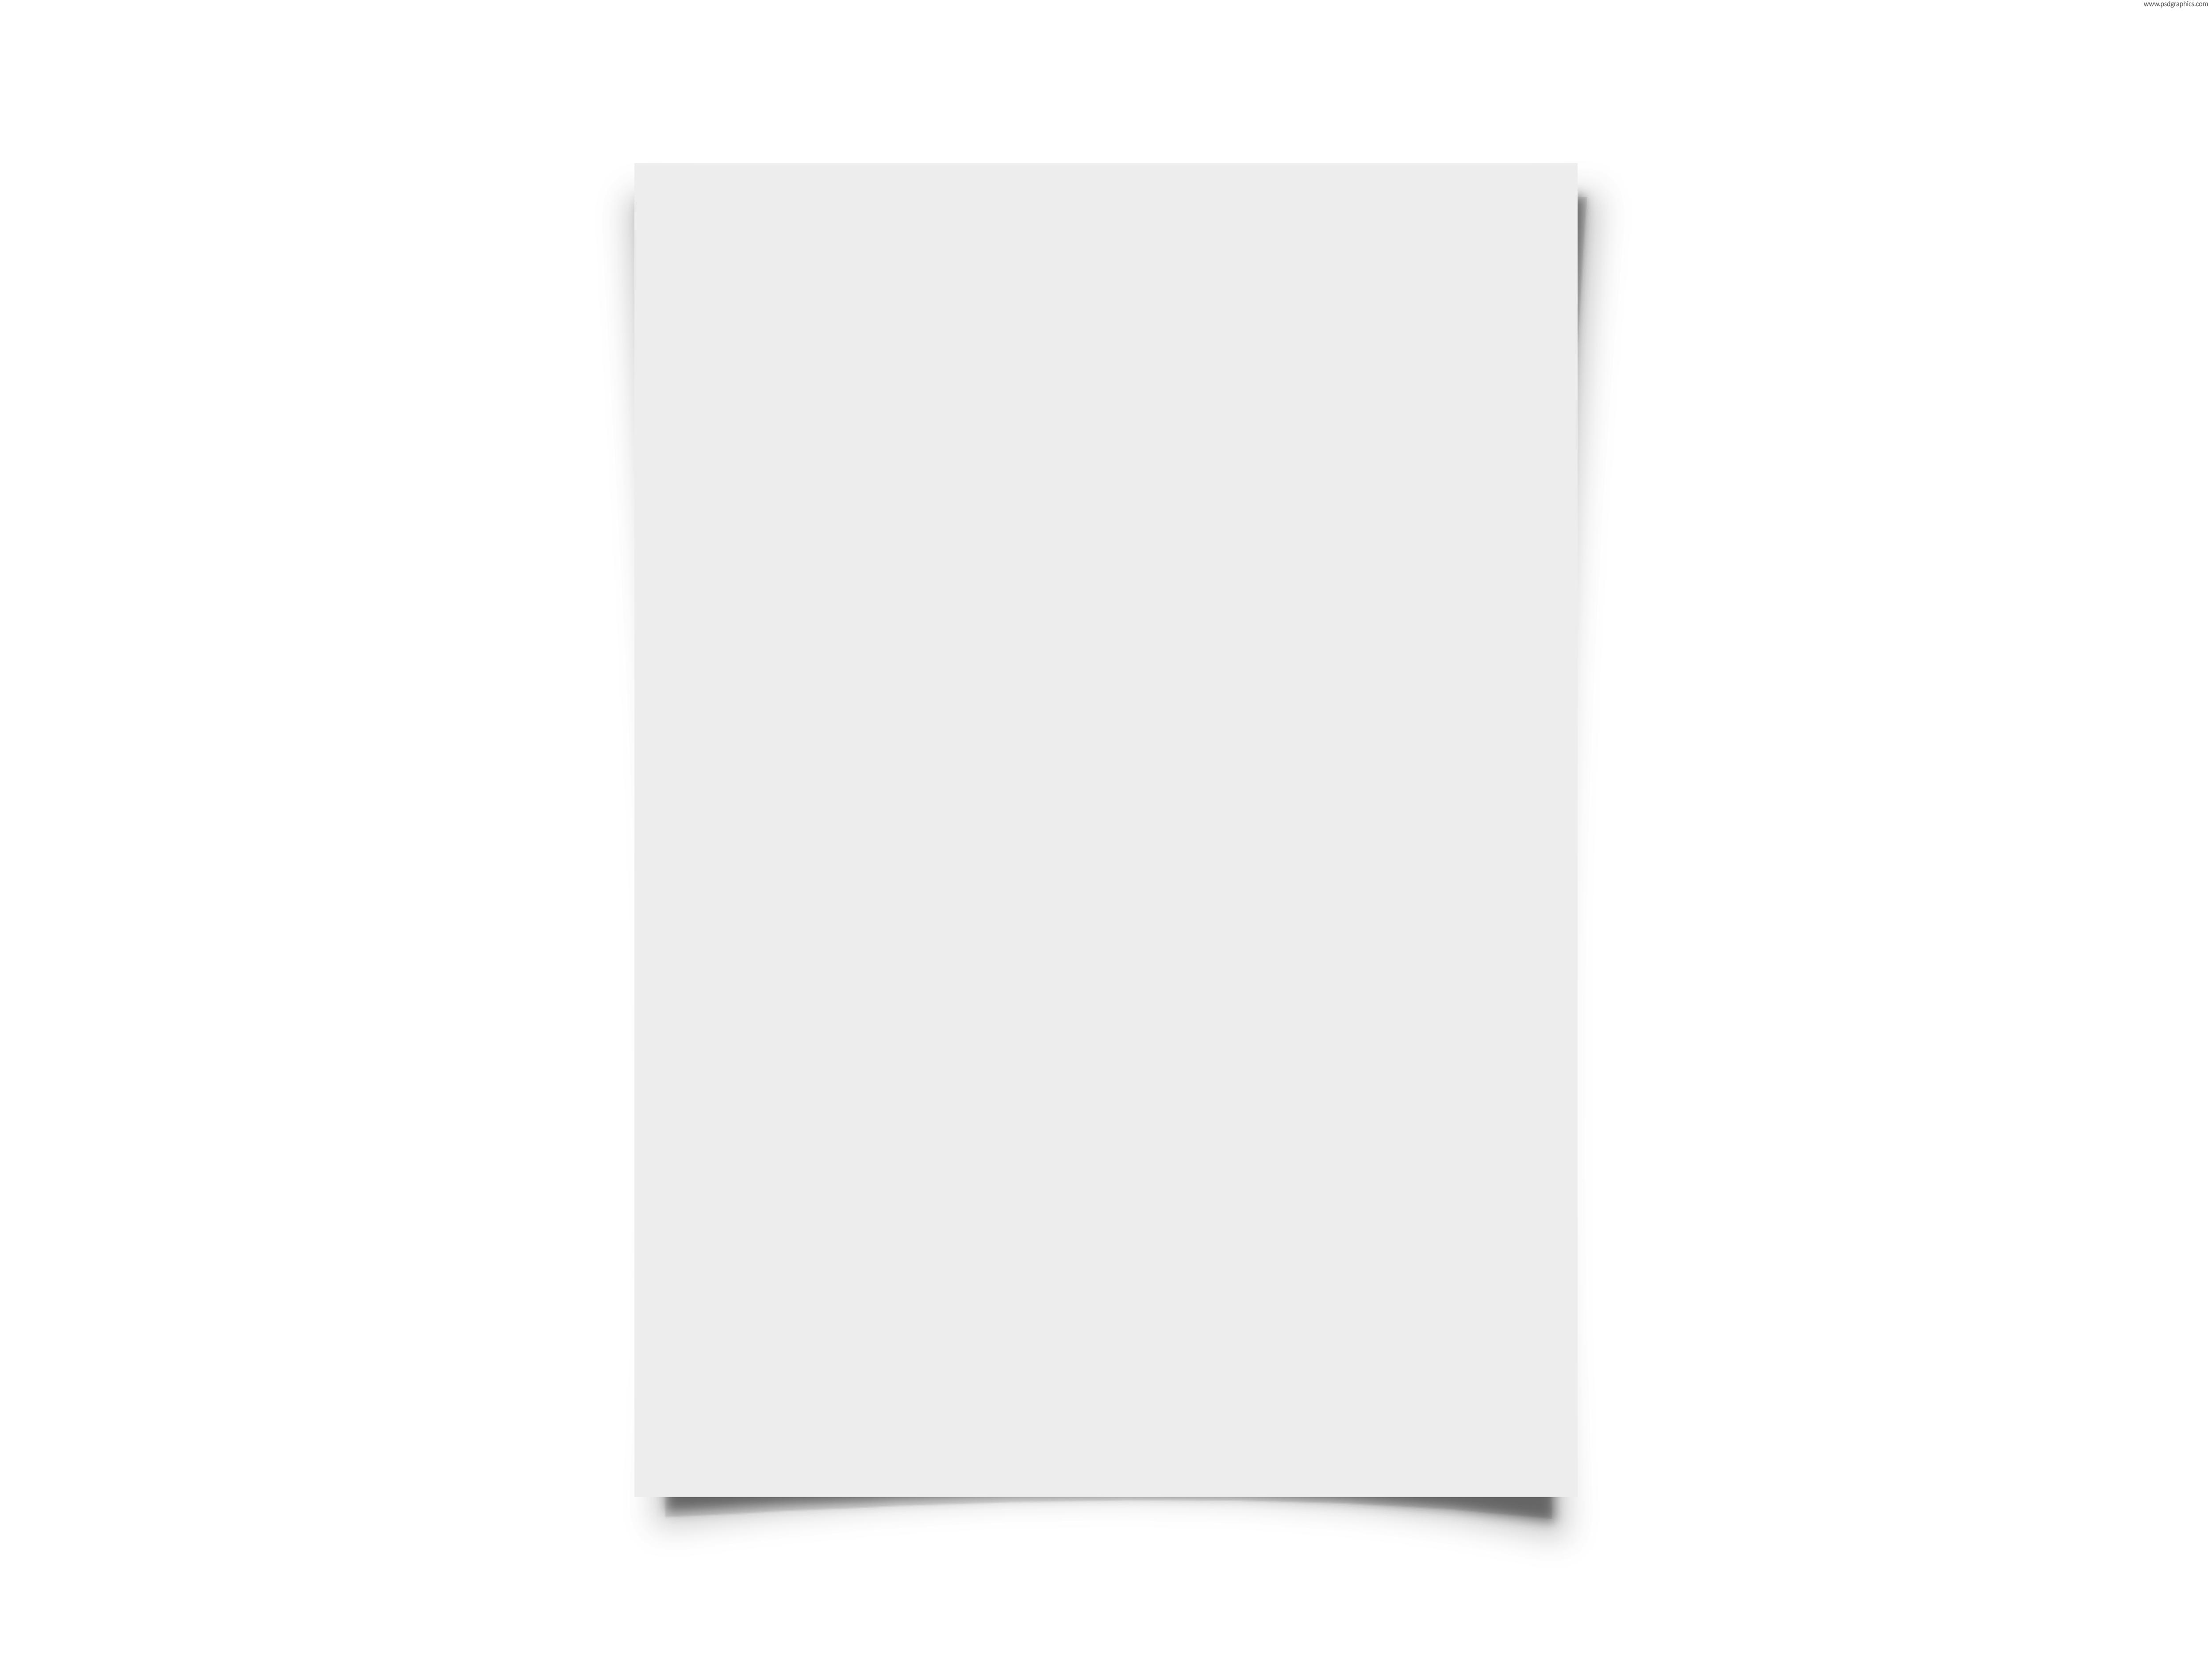 Paper Sheet PNG - 13458